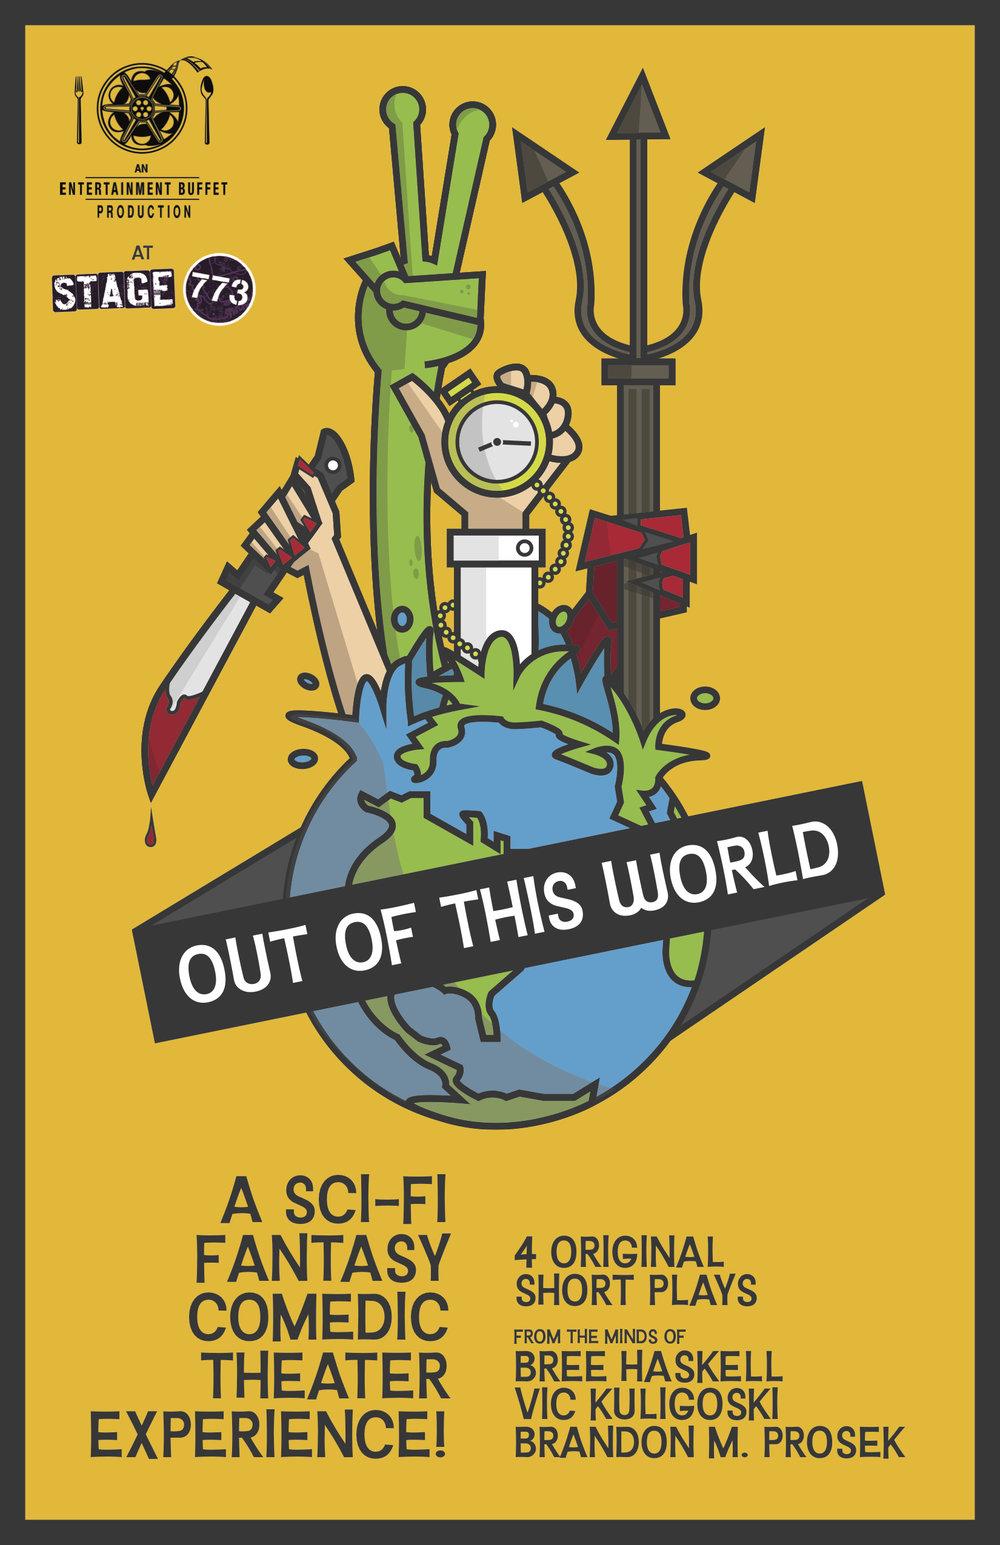 OutOfThisWorld Final Poster_11x17 .jpg